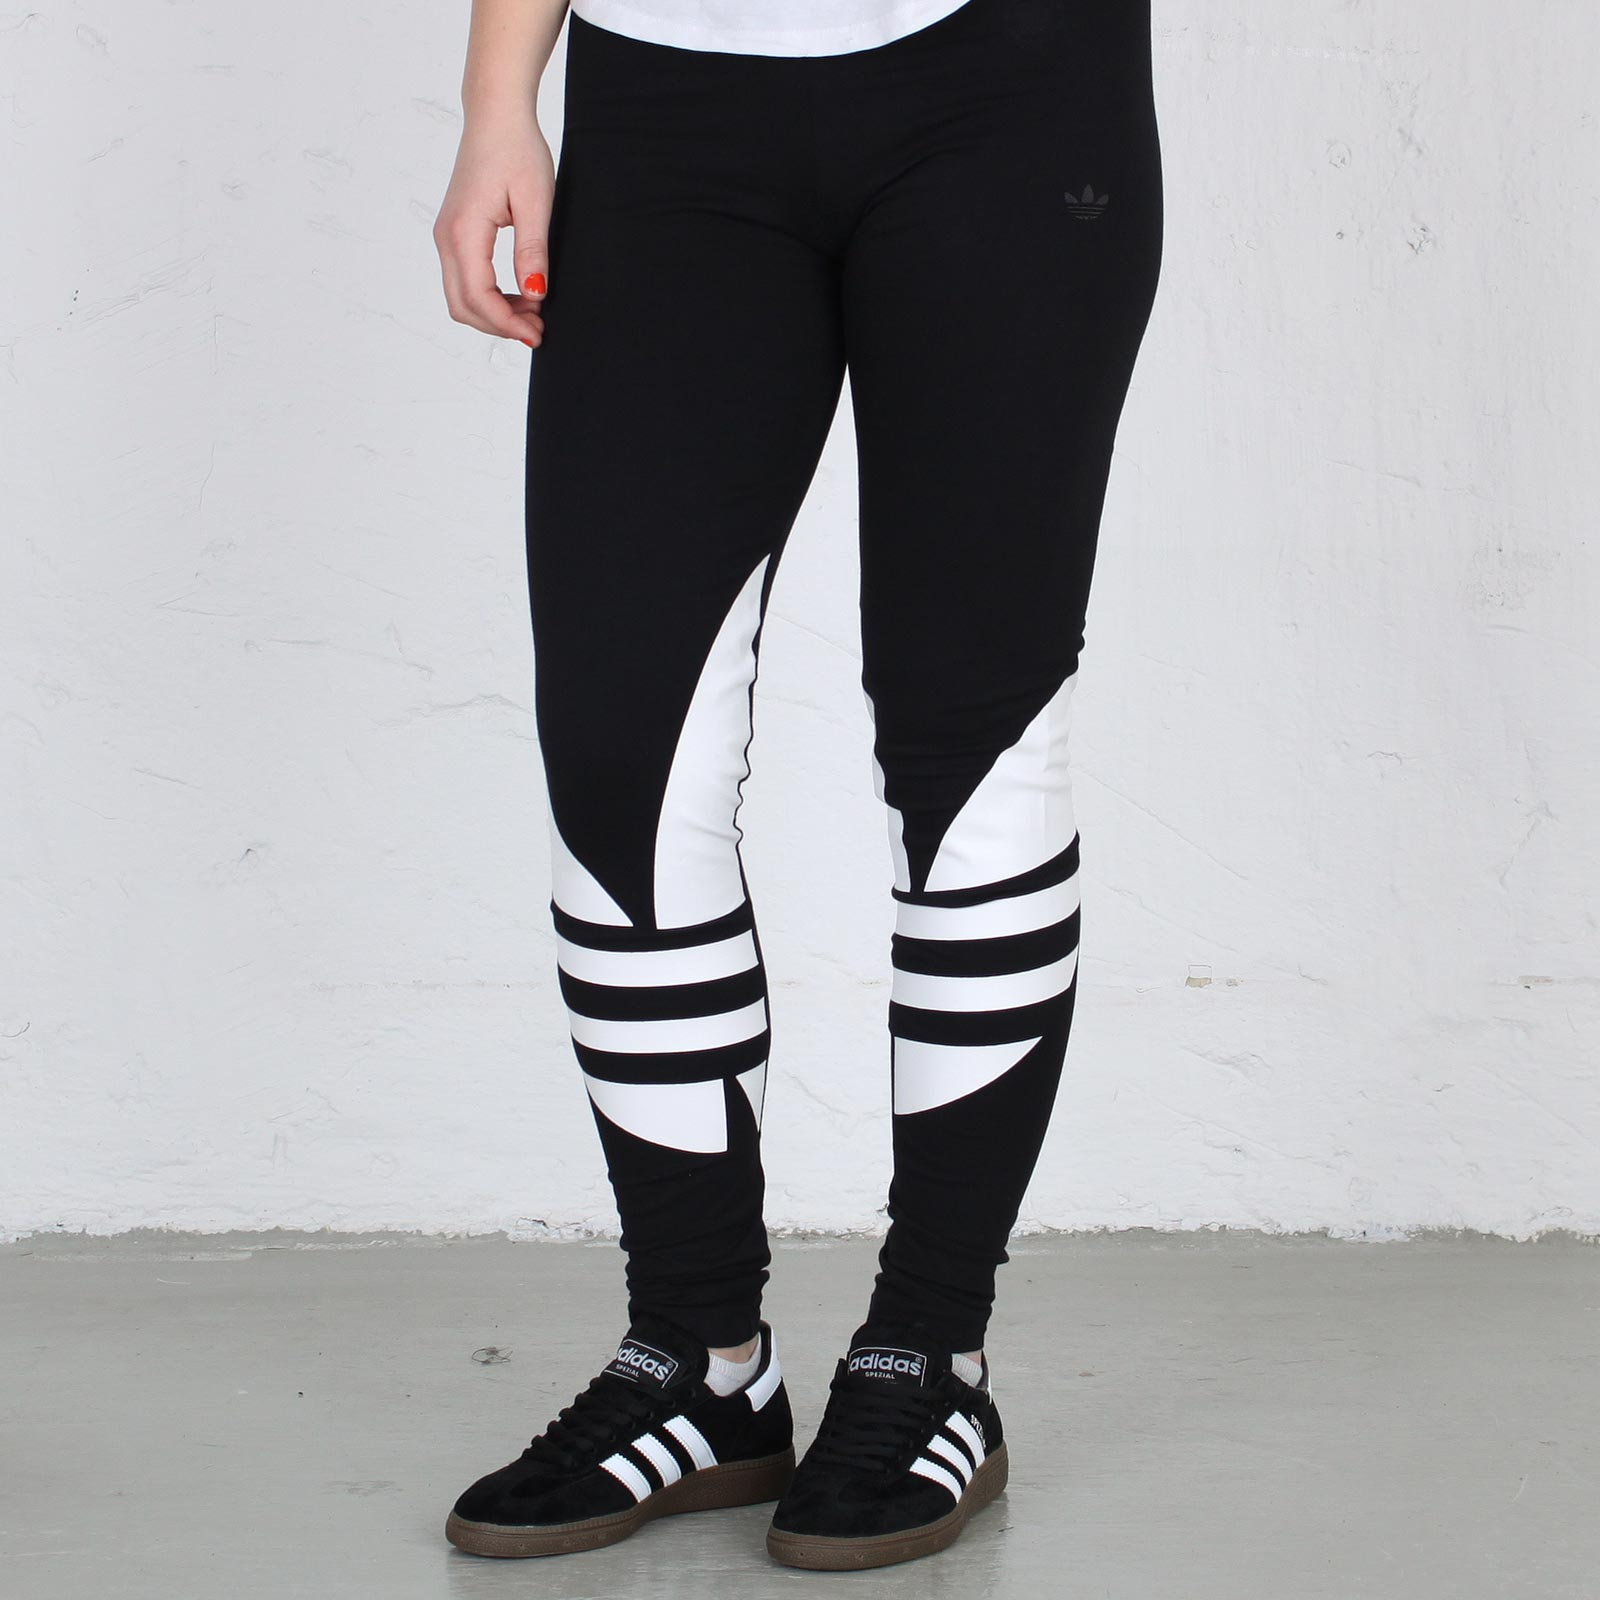 90ce31751c46 adidas CS Trefoil Leggings - 109071 - Sneakersnstuff